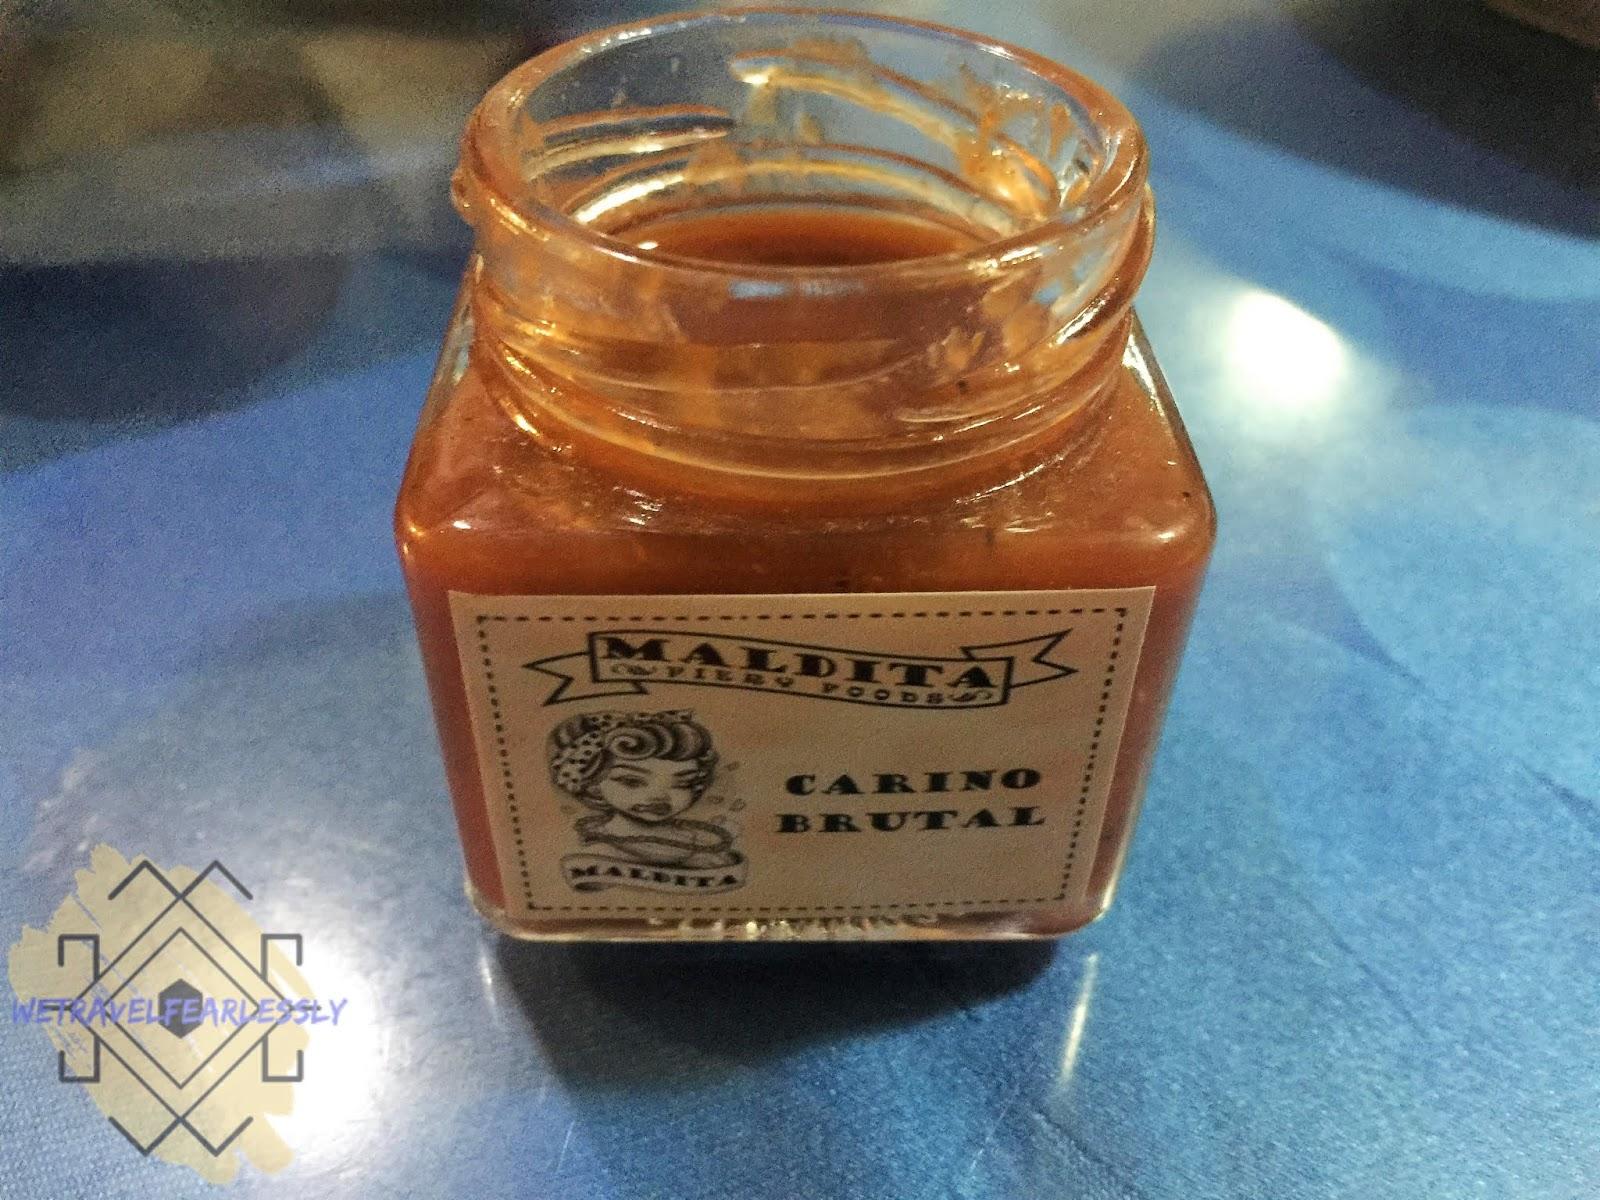 Maldita Fiery Foods - Carino Brutal